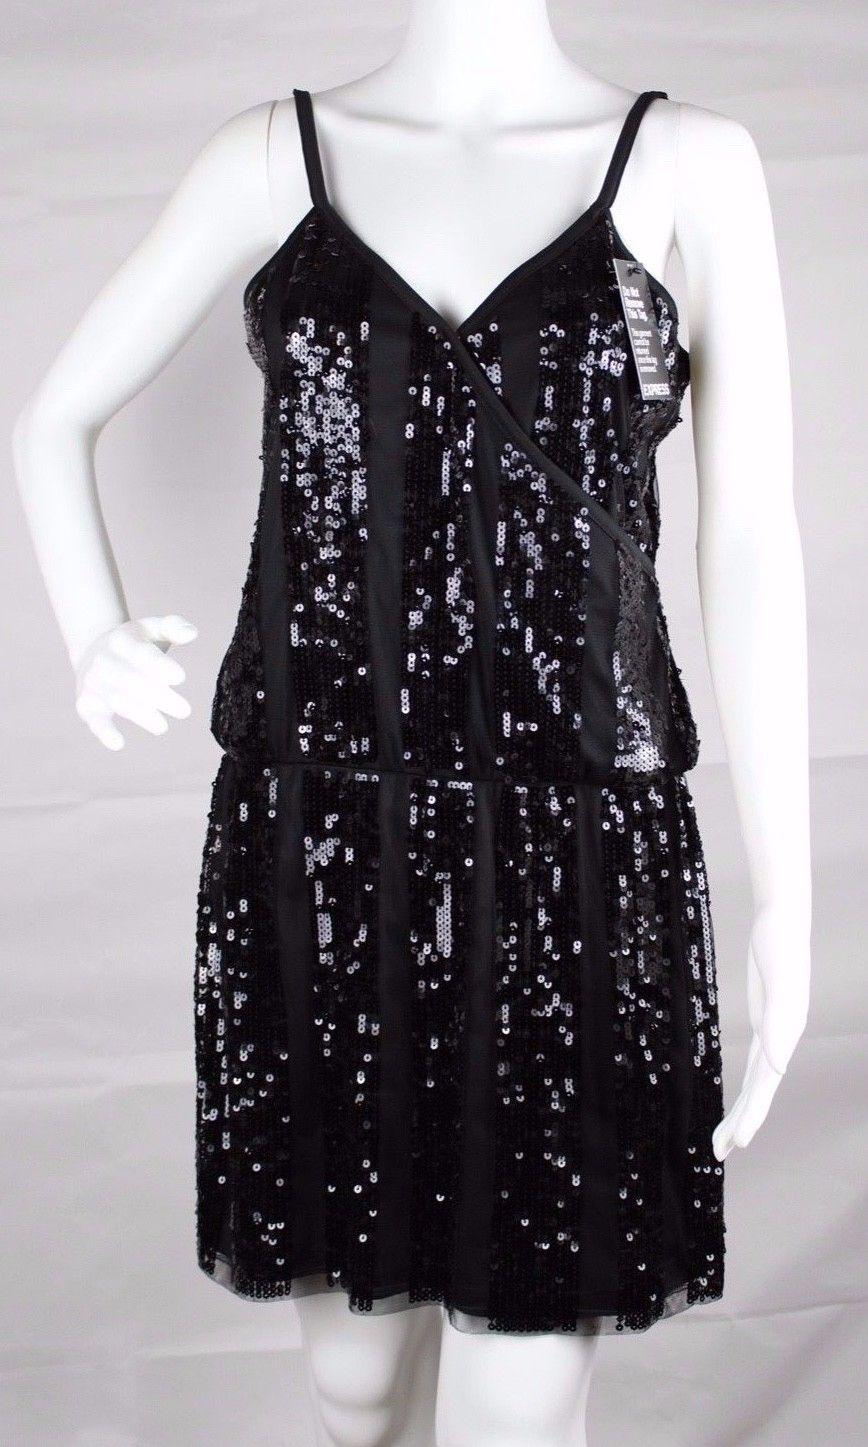 Express women's dress sequin sleeveless black party dress size M image 6